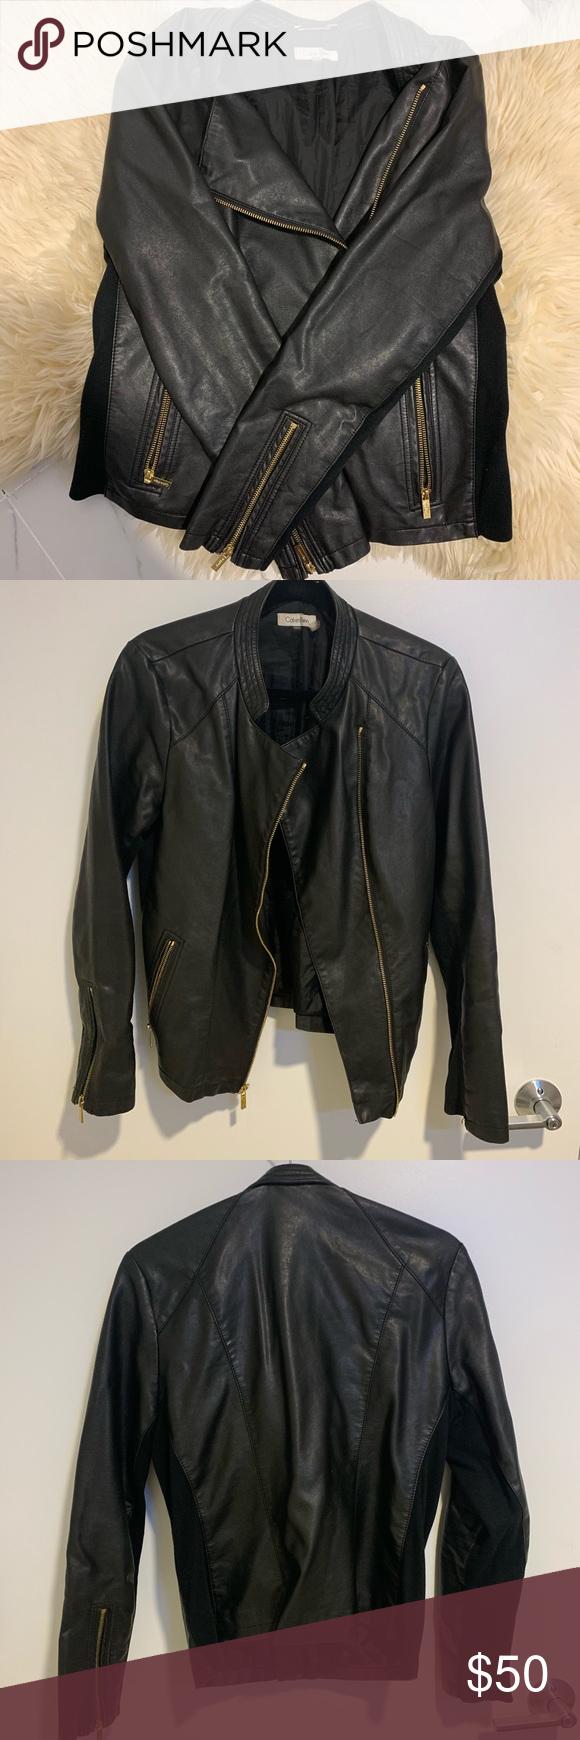 Calvin Klein Black Leather Jacket Calvin Klein Black